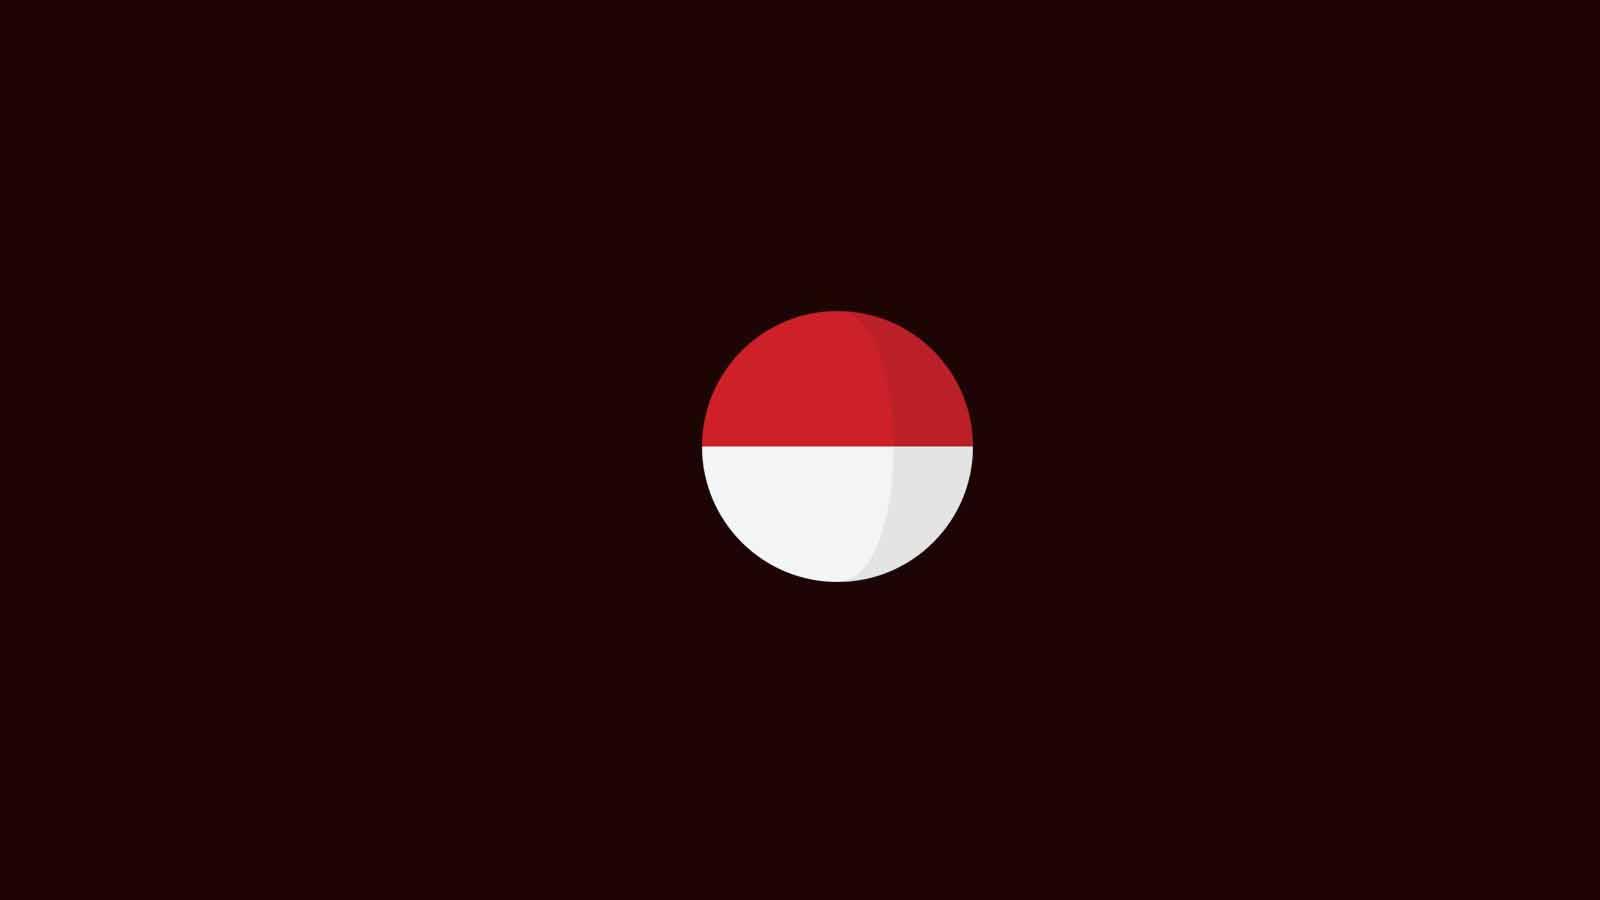 Daftar Isi - Kosakata Bahasa Indoneisa